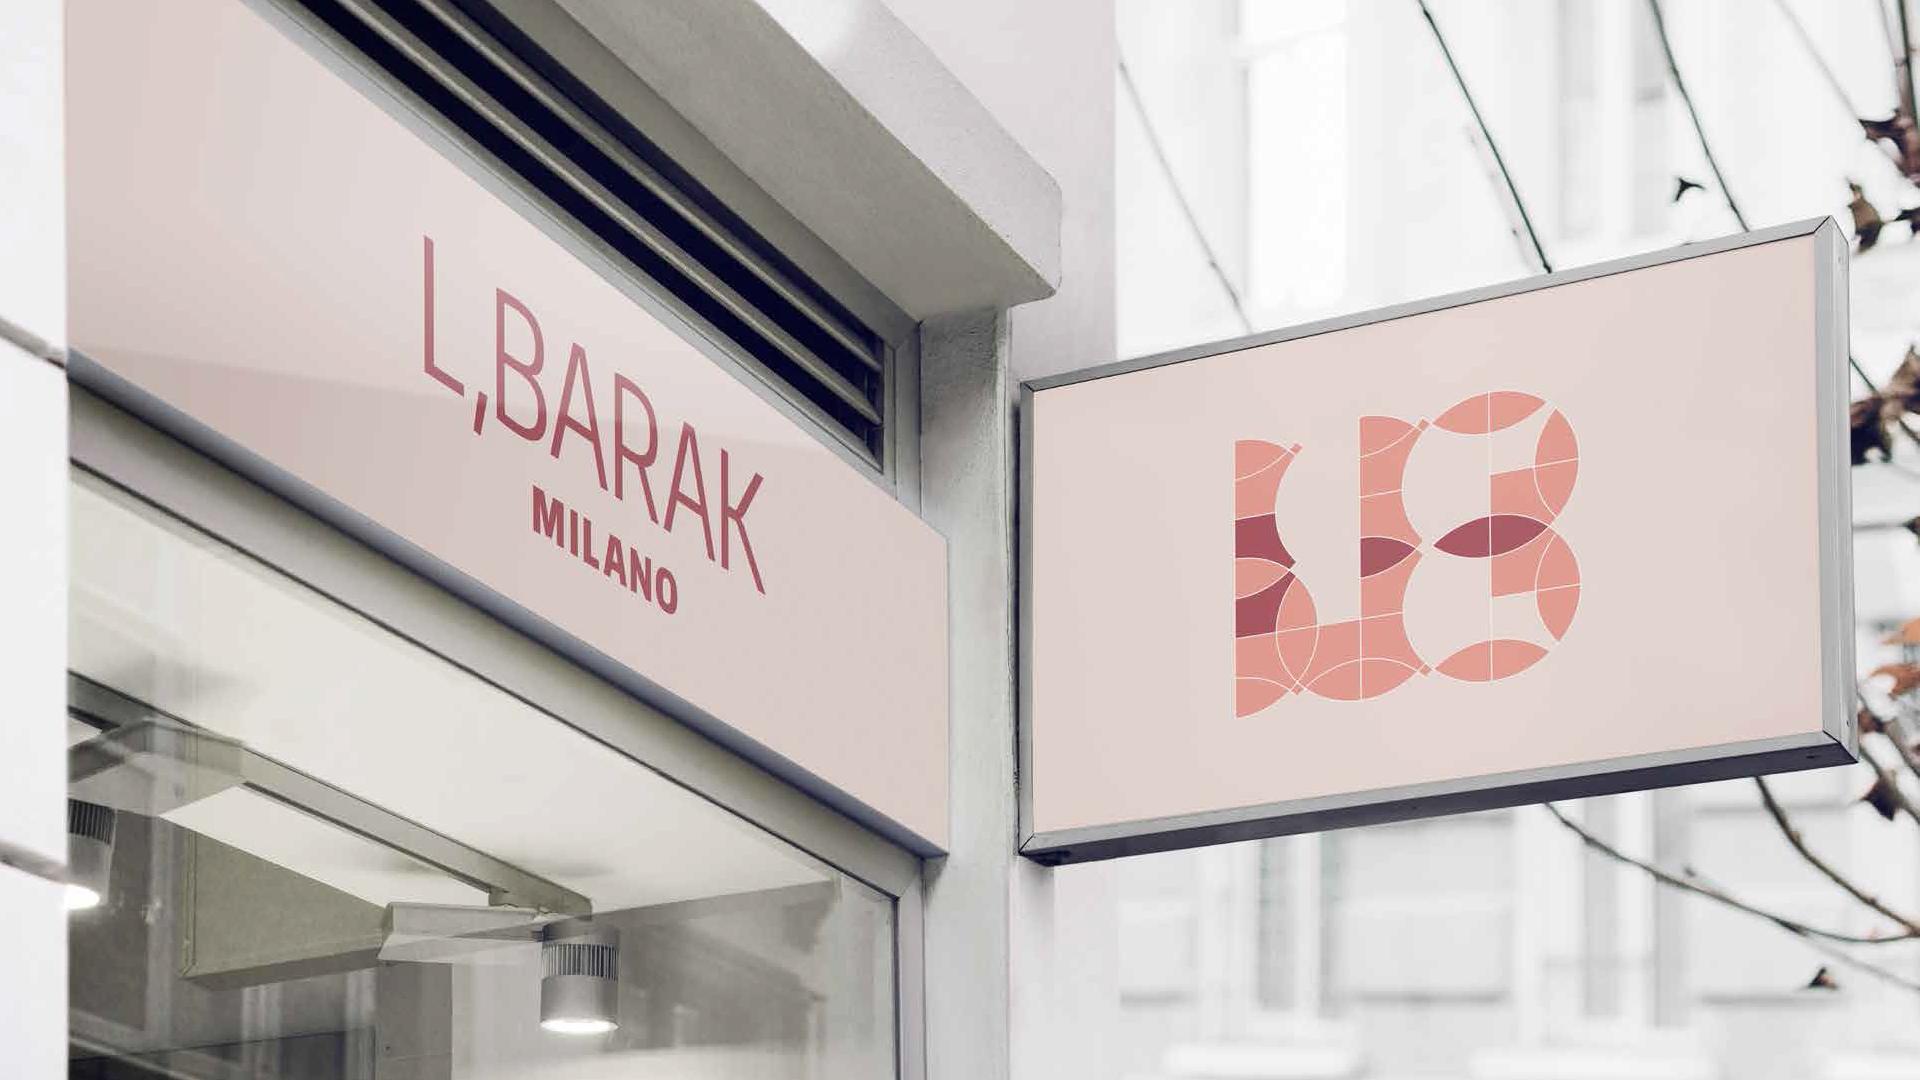 L Barak_Branding-11 copy